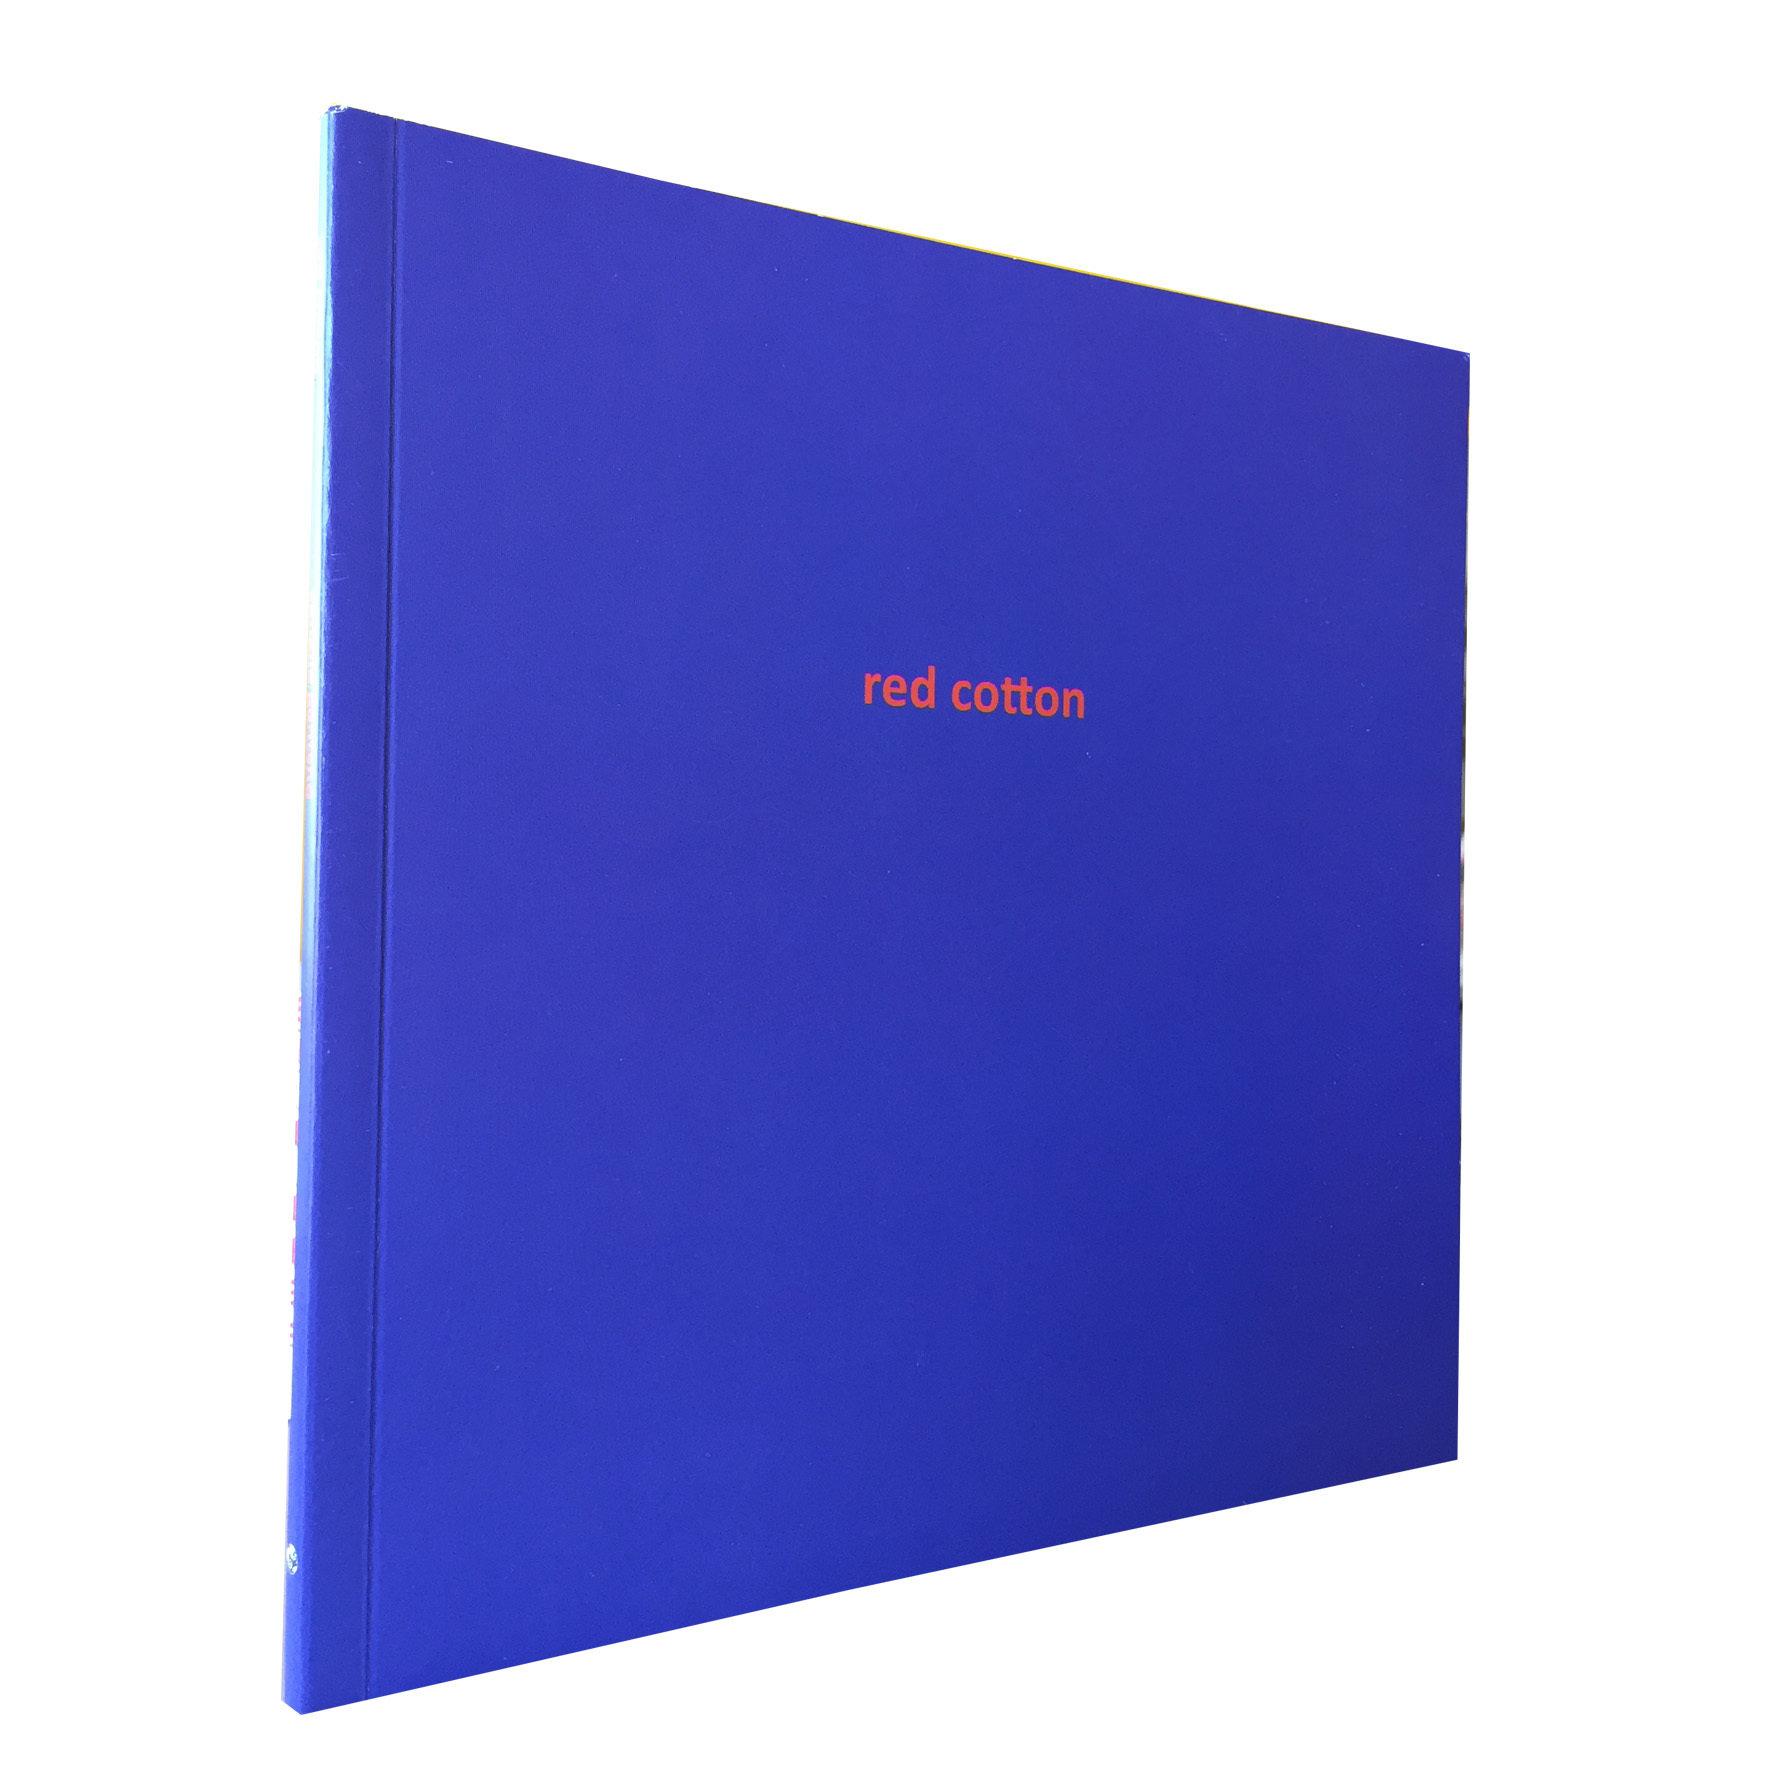 Red Cotton by Vangile Gantsho (Impepho Press) IP03